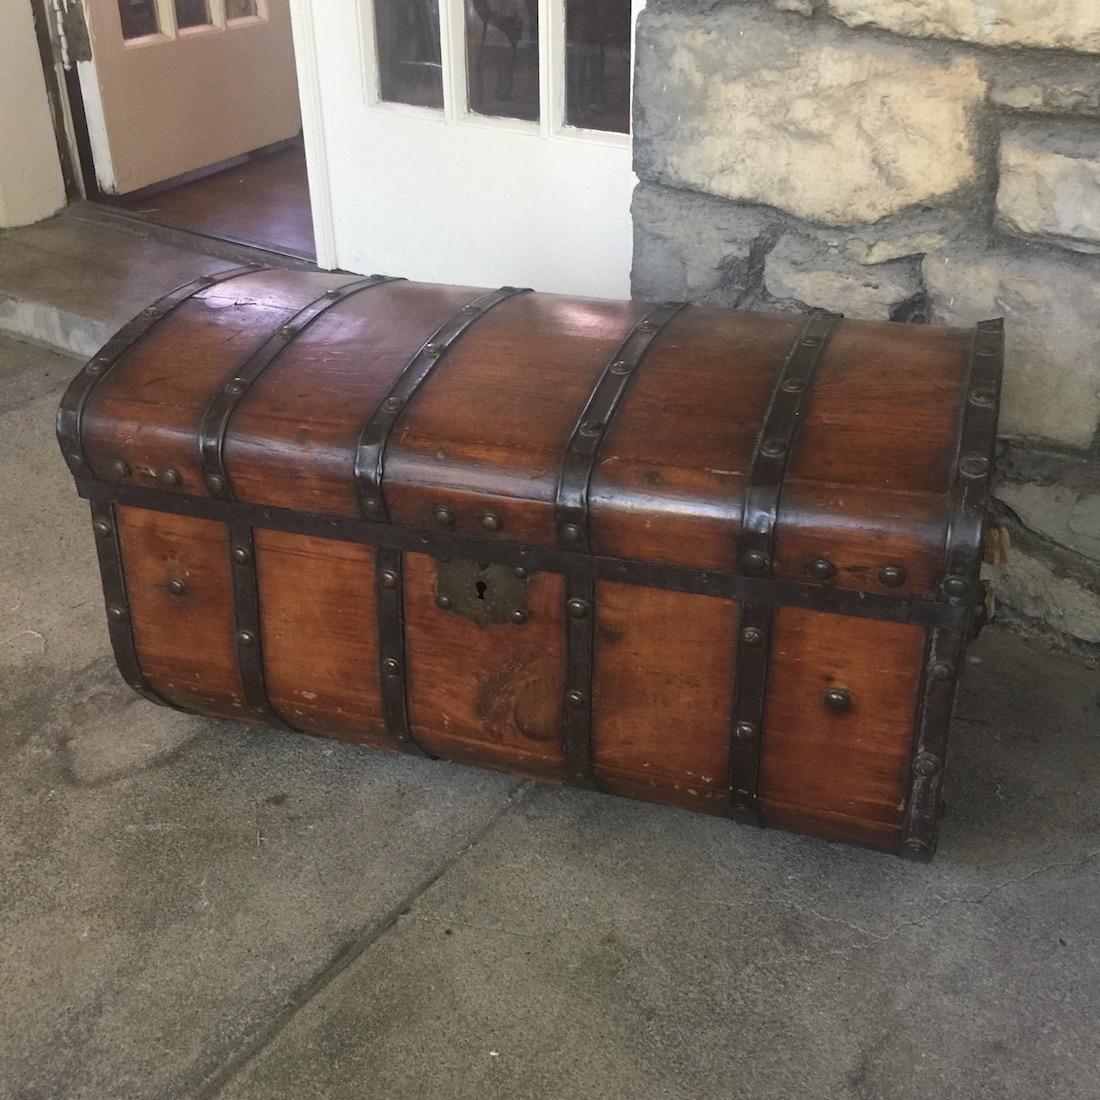 Antique furniture - 19th C. Sea Chest With Metal Straps Antique Furniture Pinterest